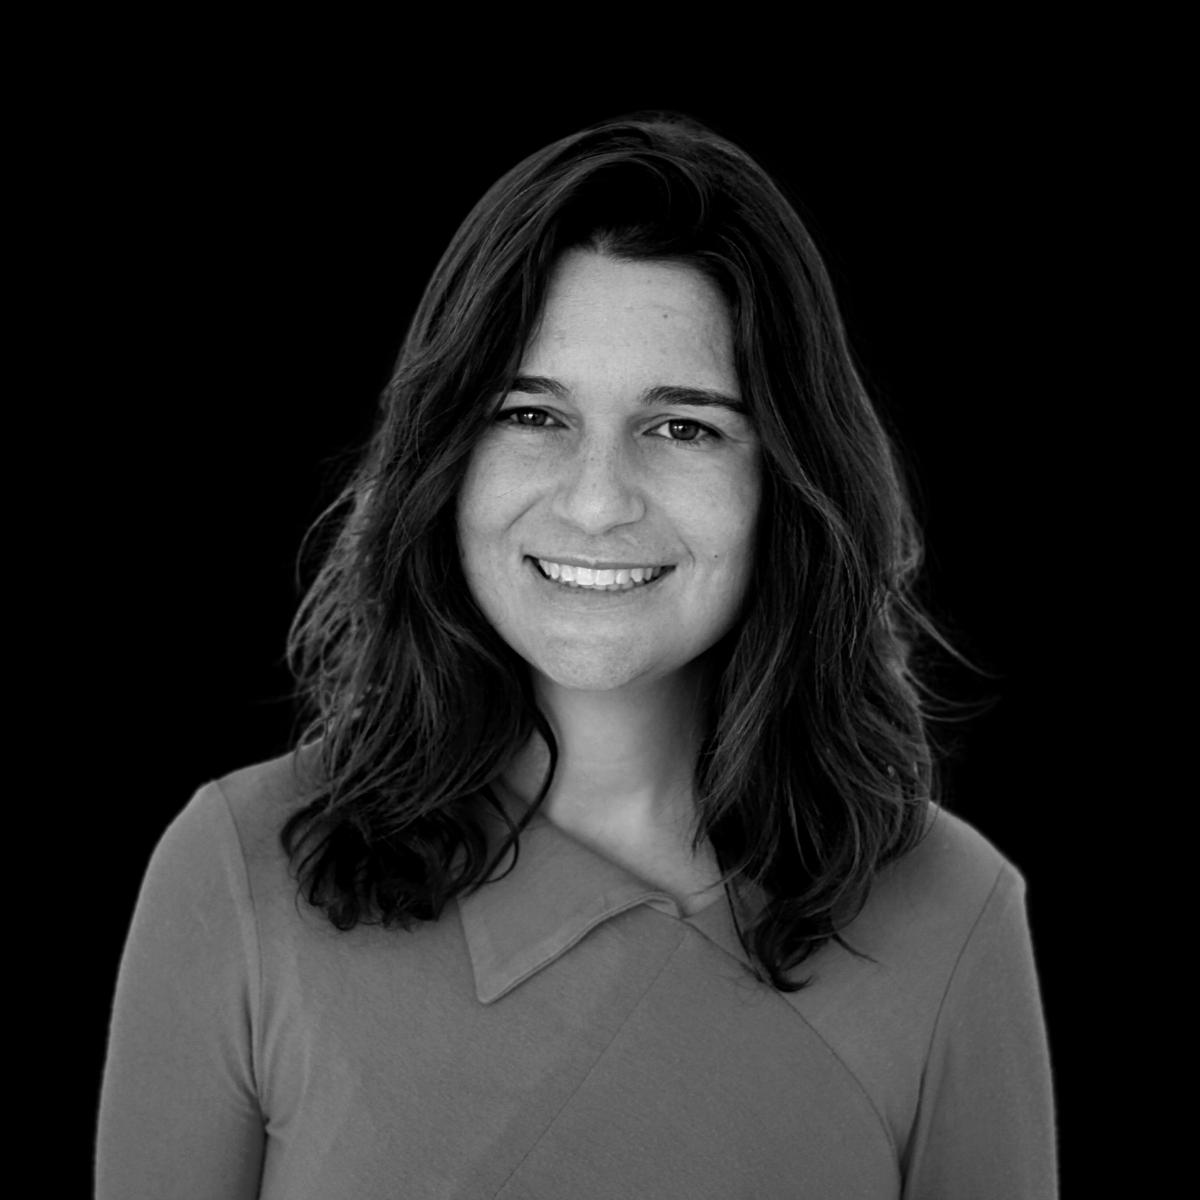 Casilda Heraso | Social Impact